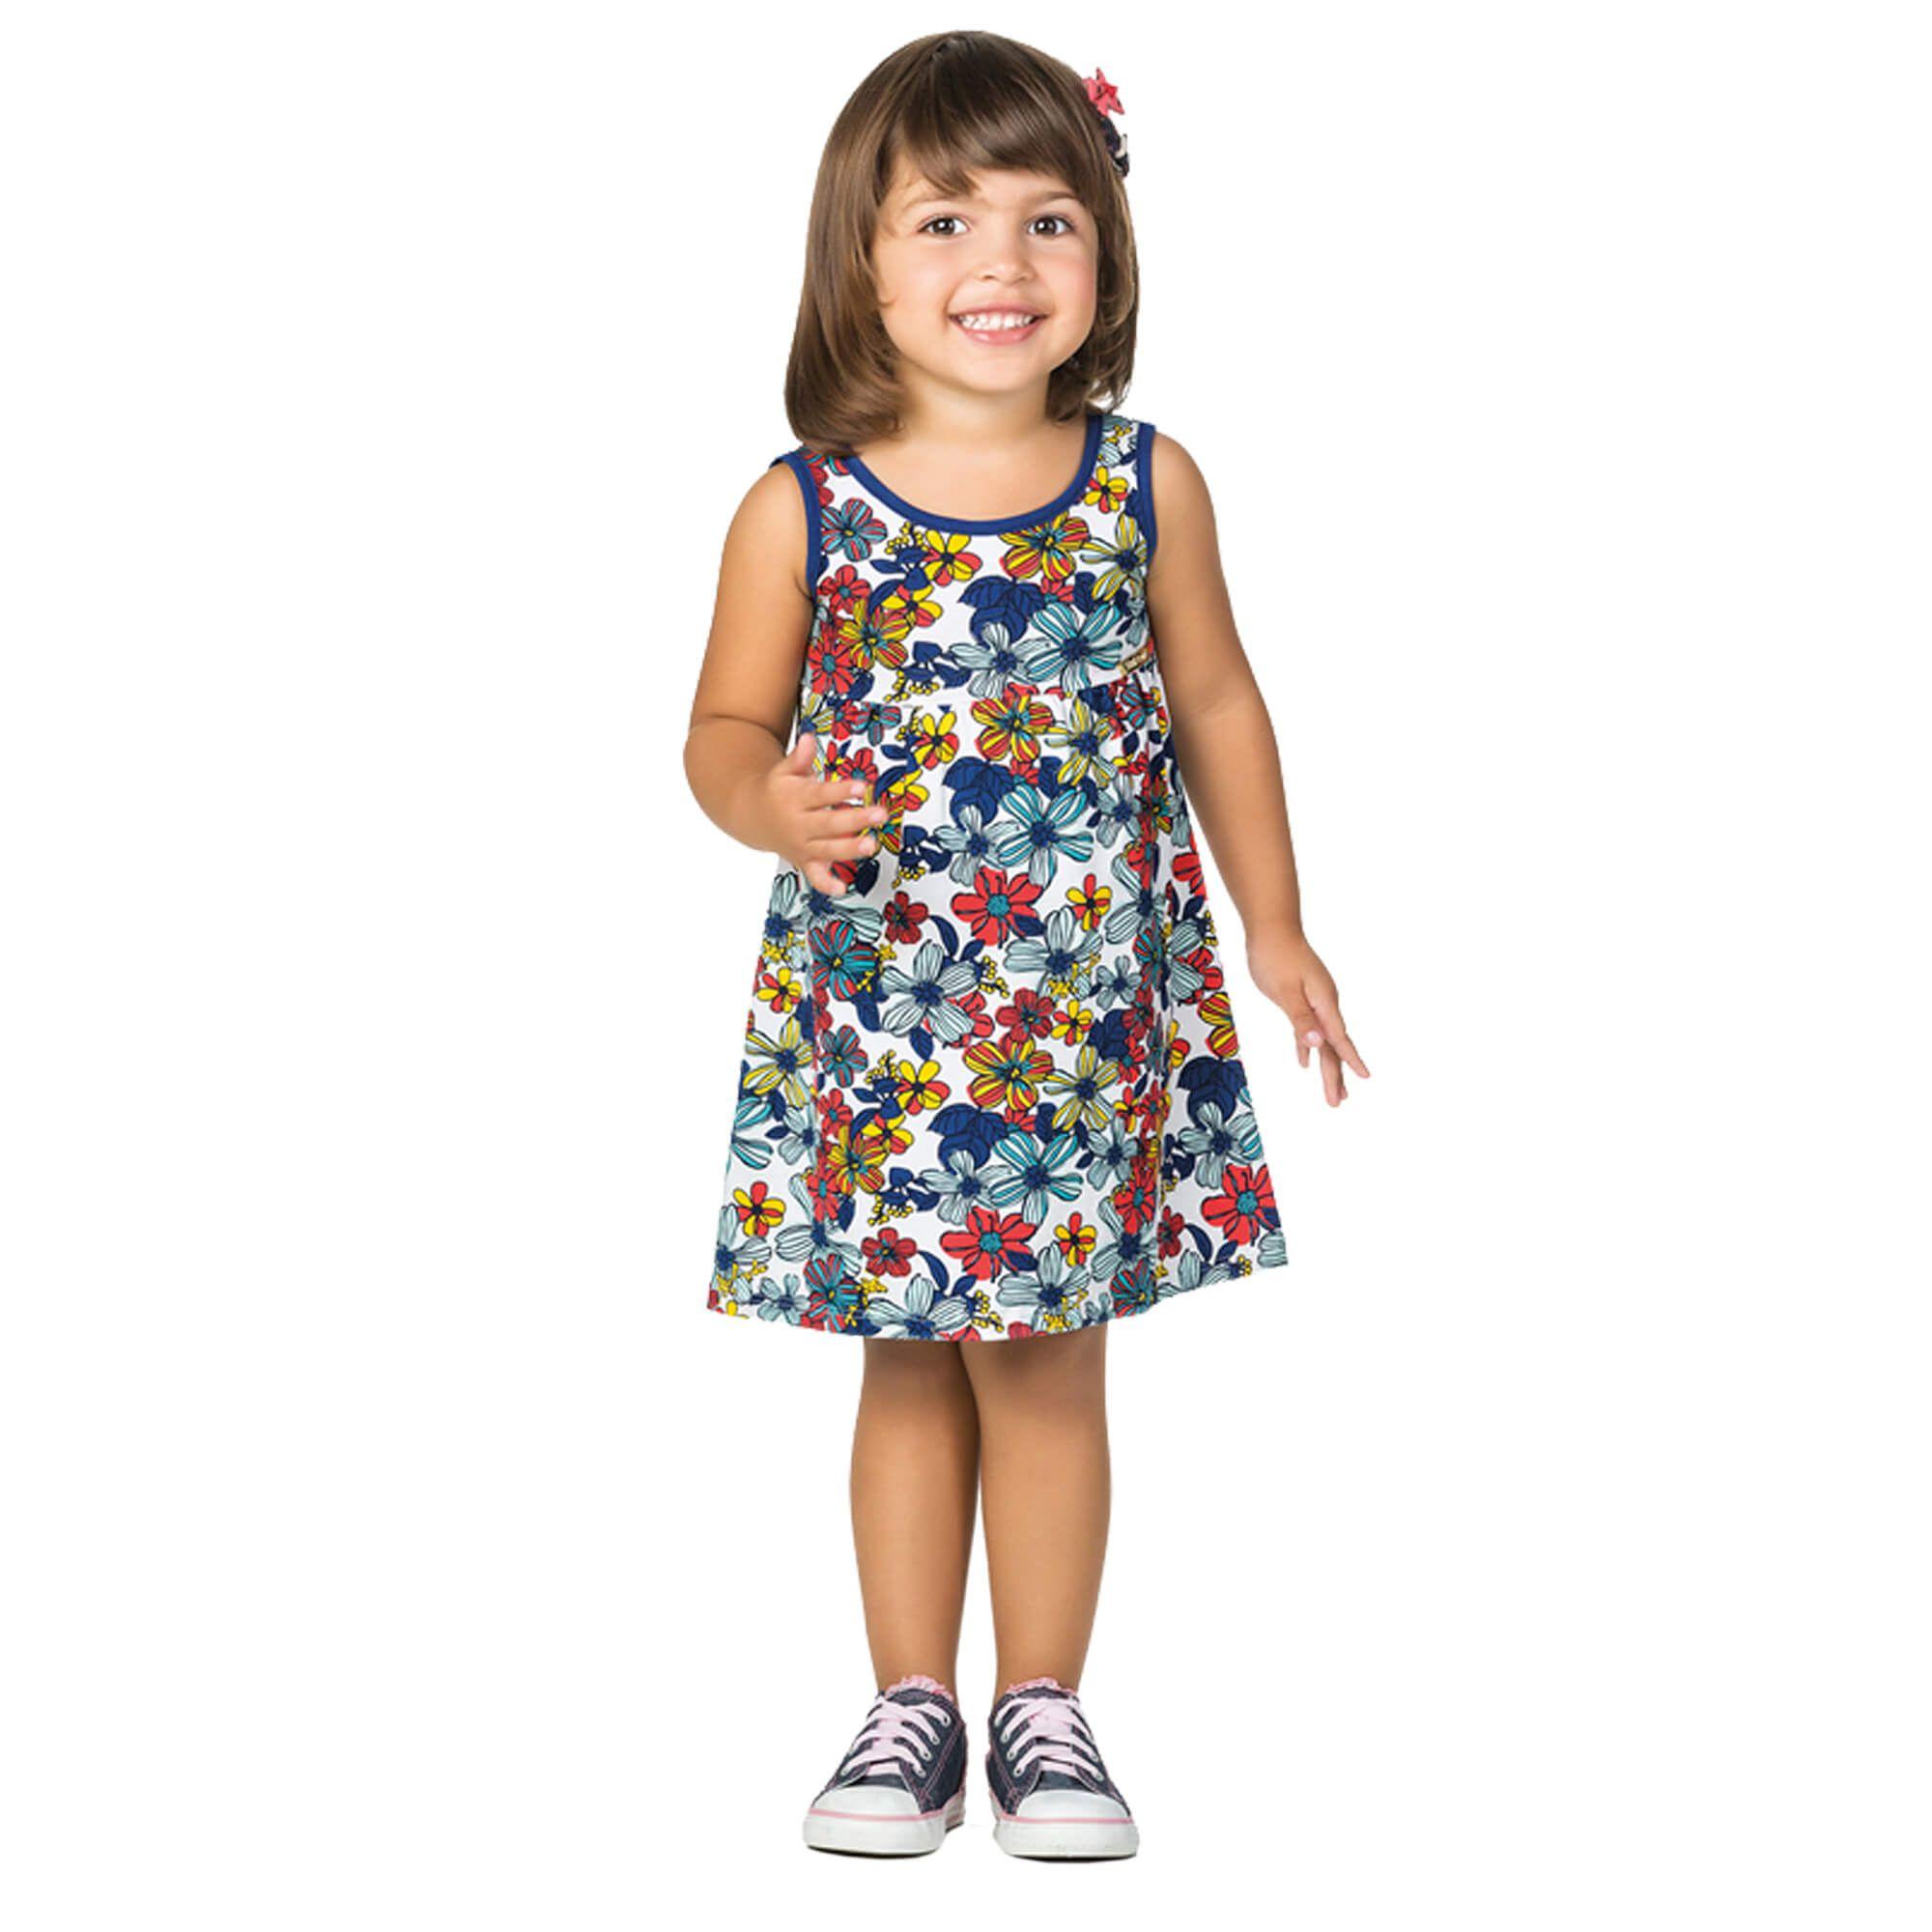 Vestido Alakazoo Meia Malha - P ao G